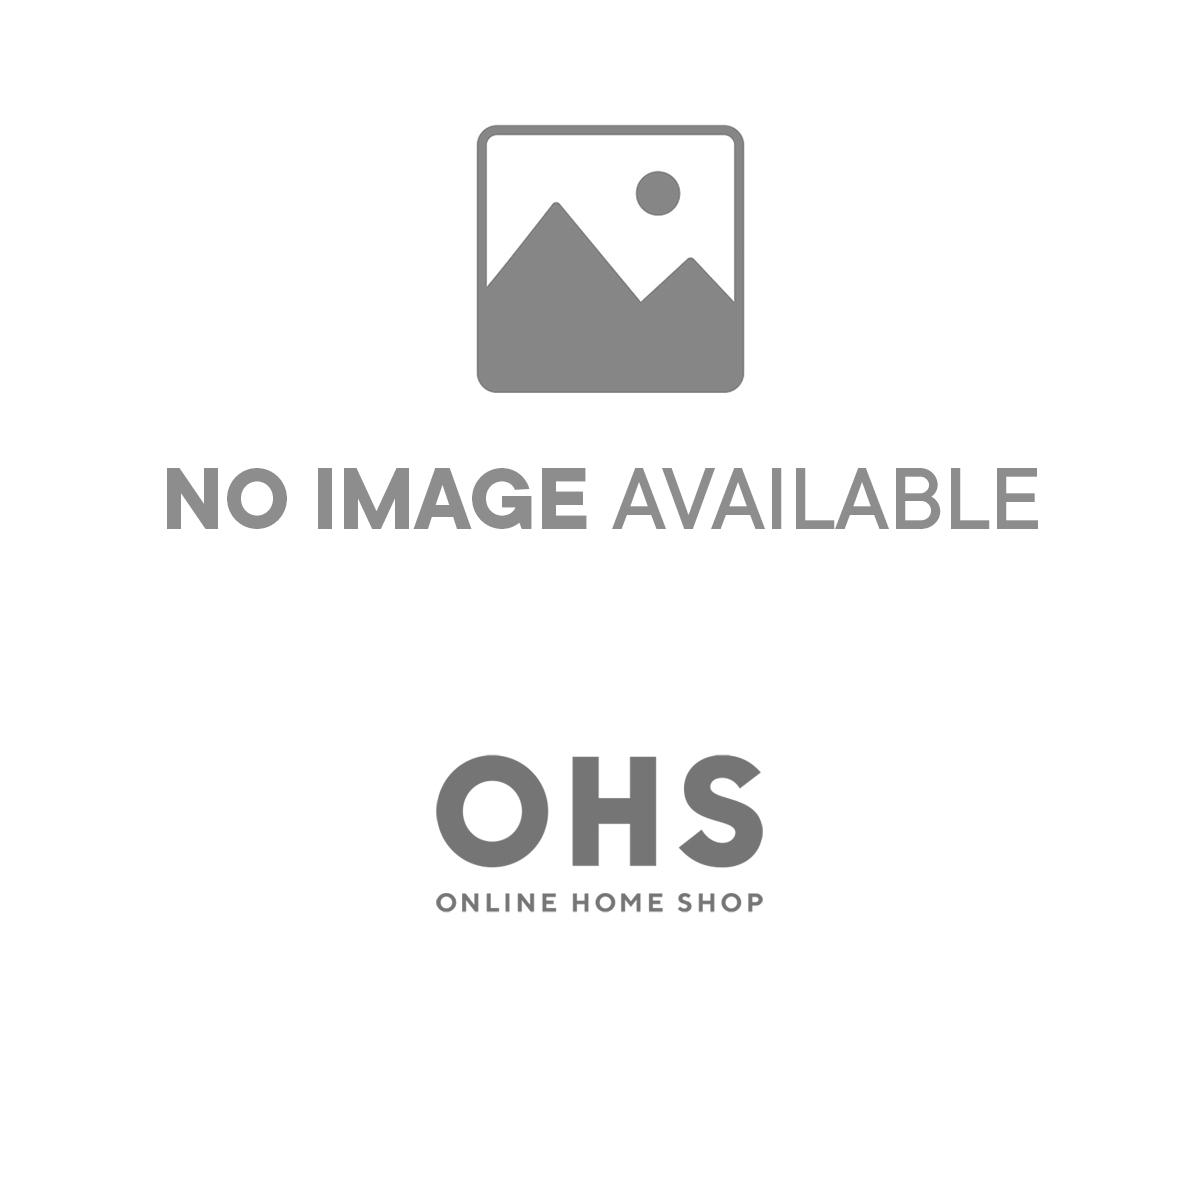 Dreamscene Gym Addict Pug Duvet Cover Set, White - Double